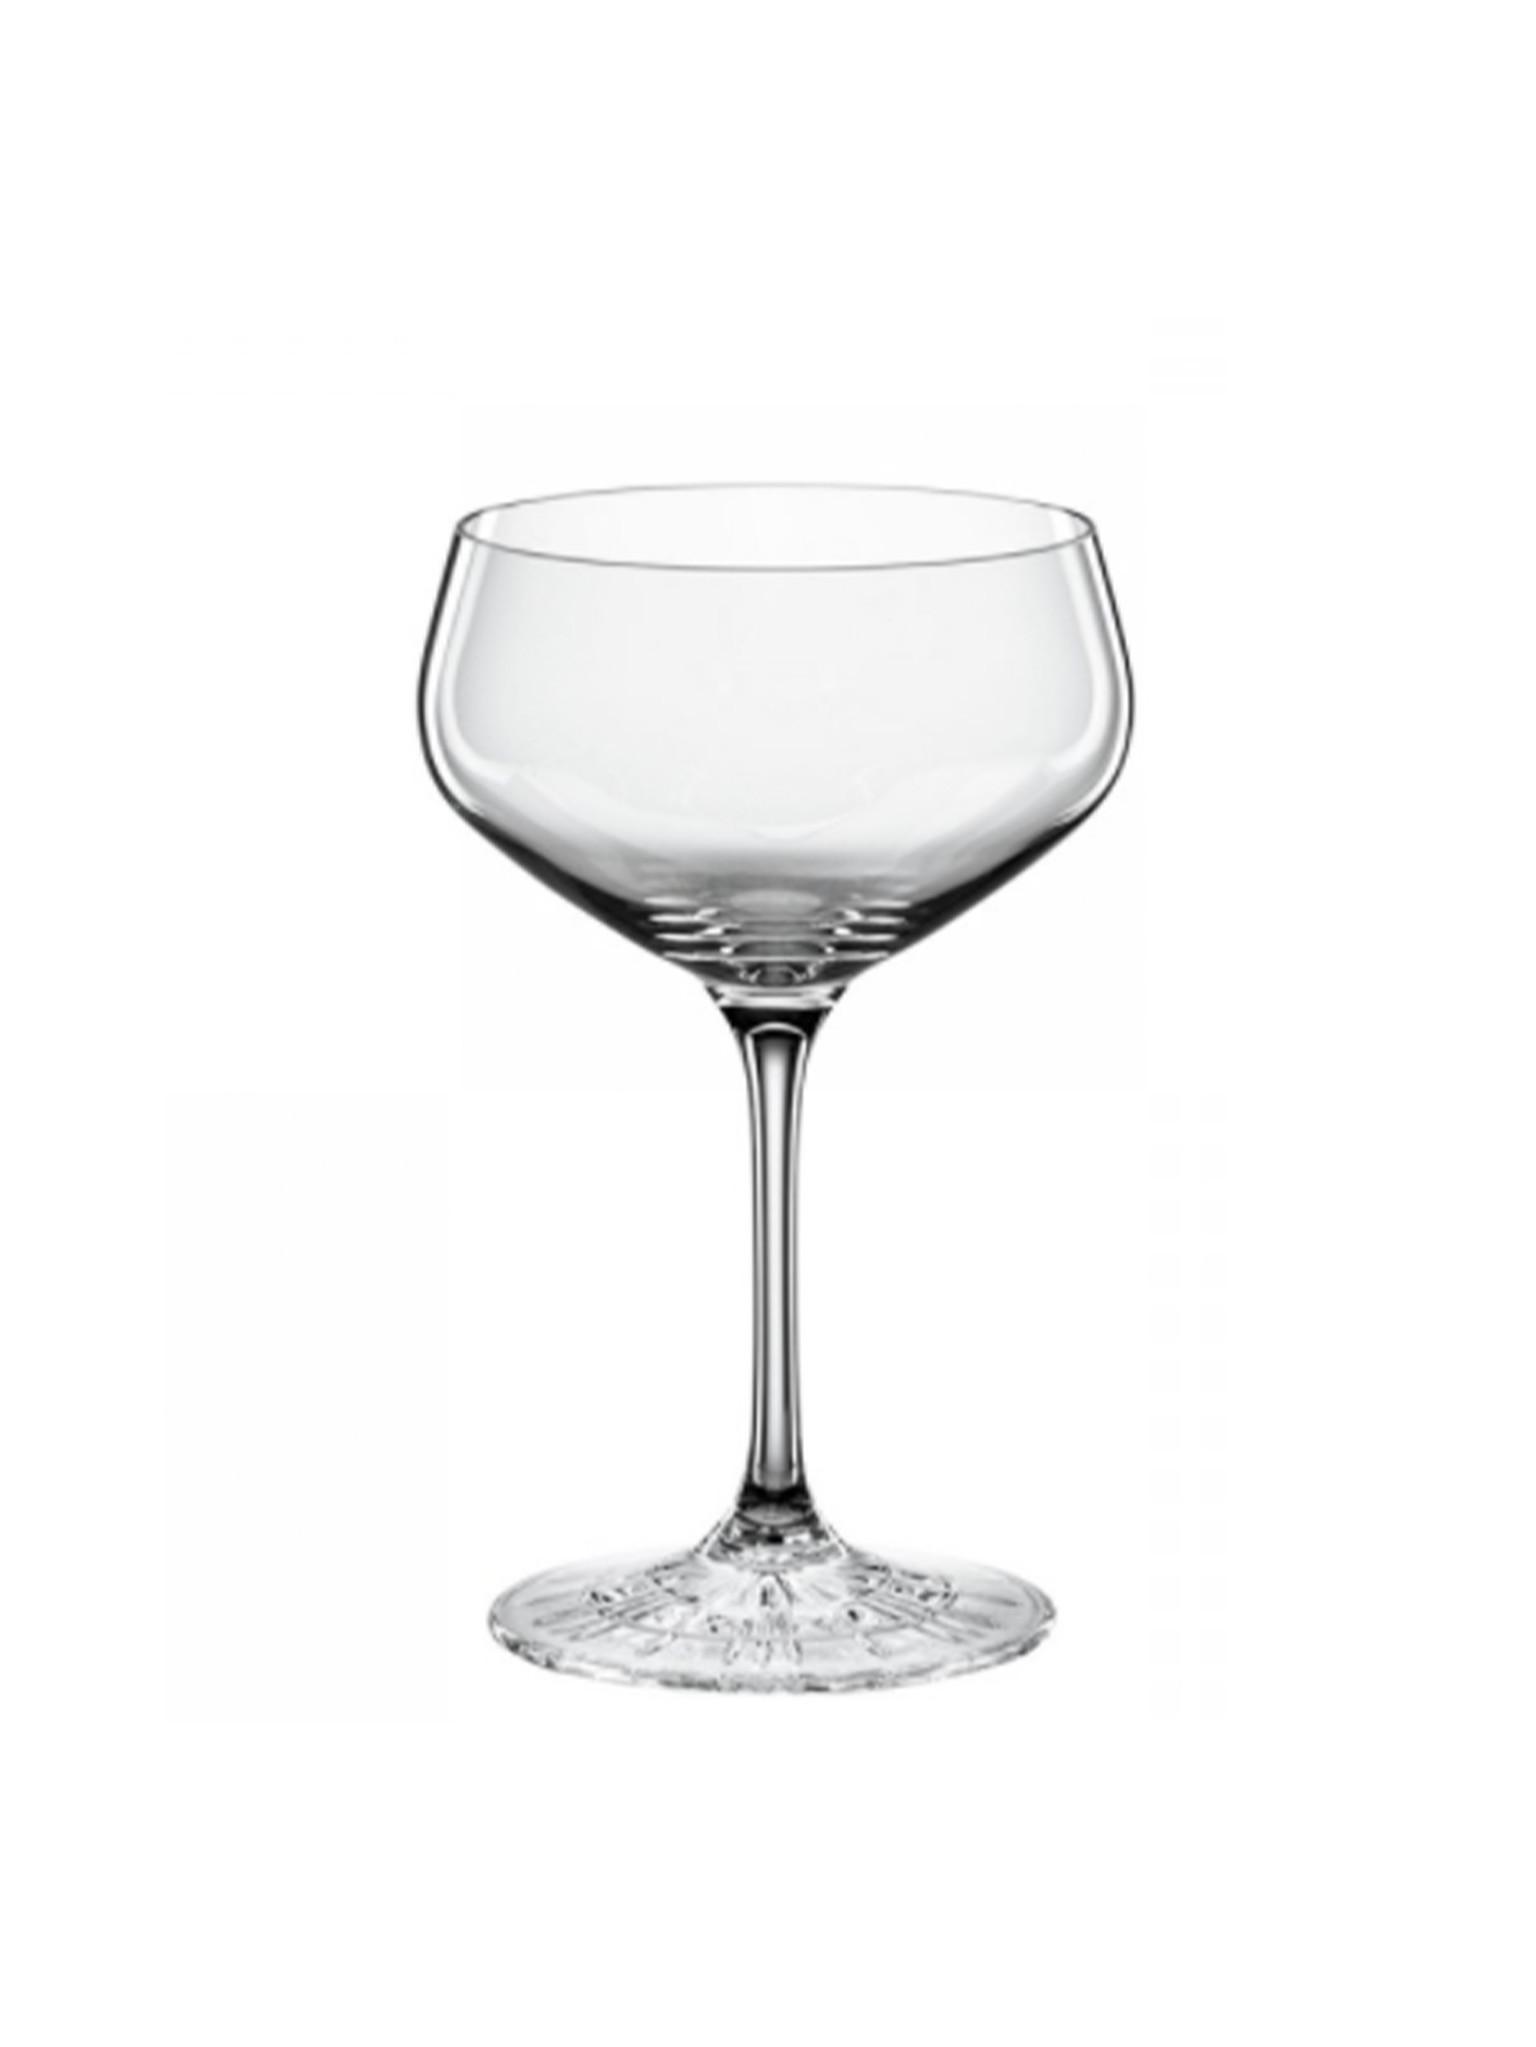 Spiegelau Perfect Coupette Glass Set of 4-1